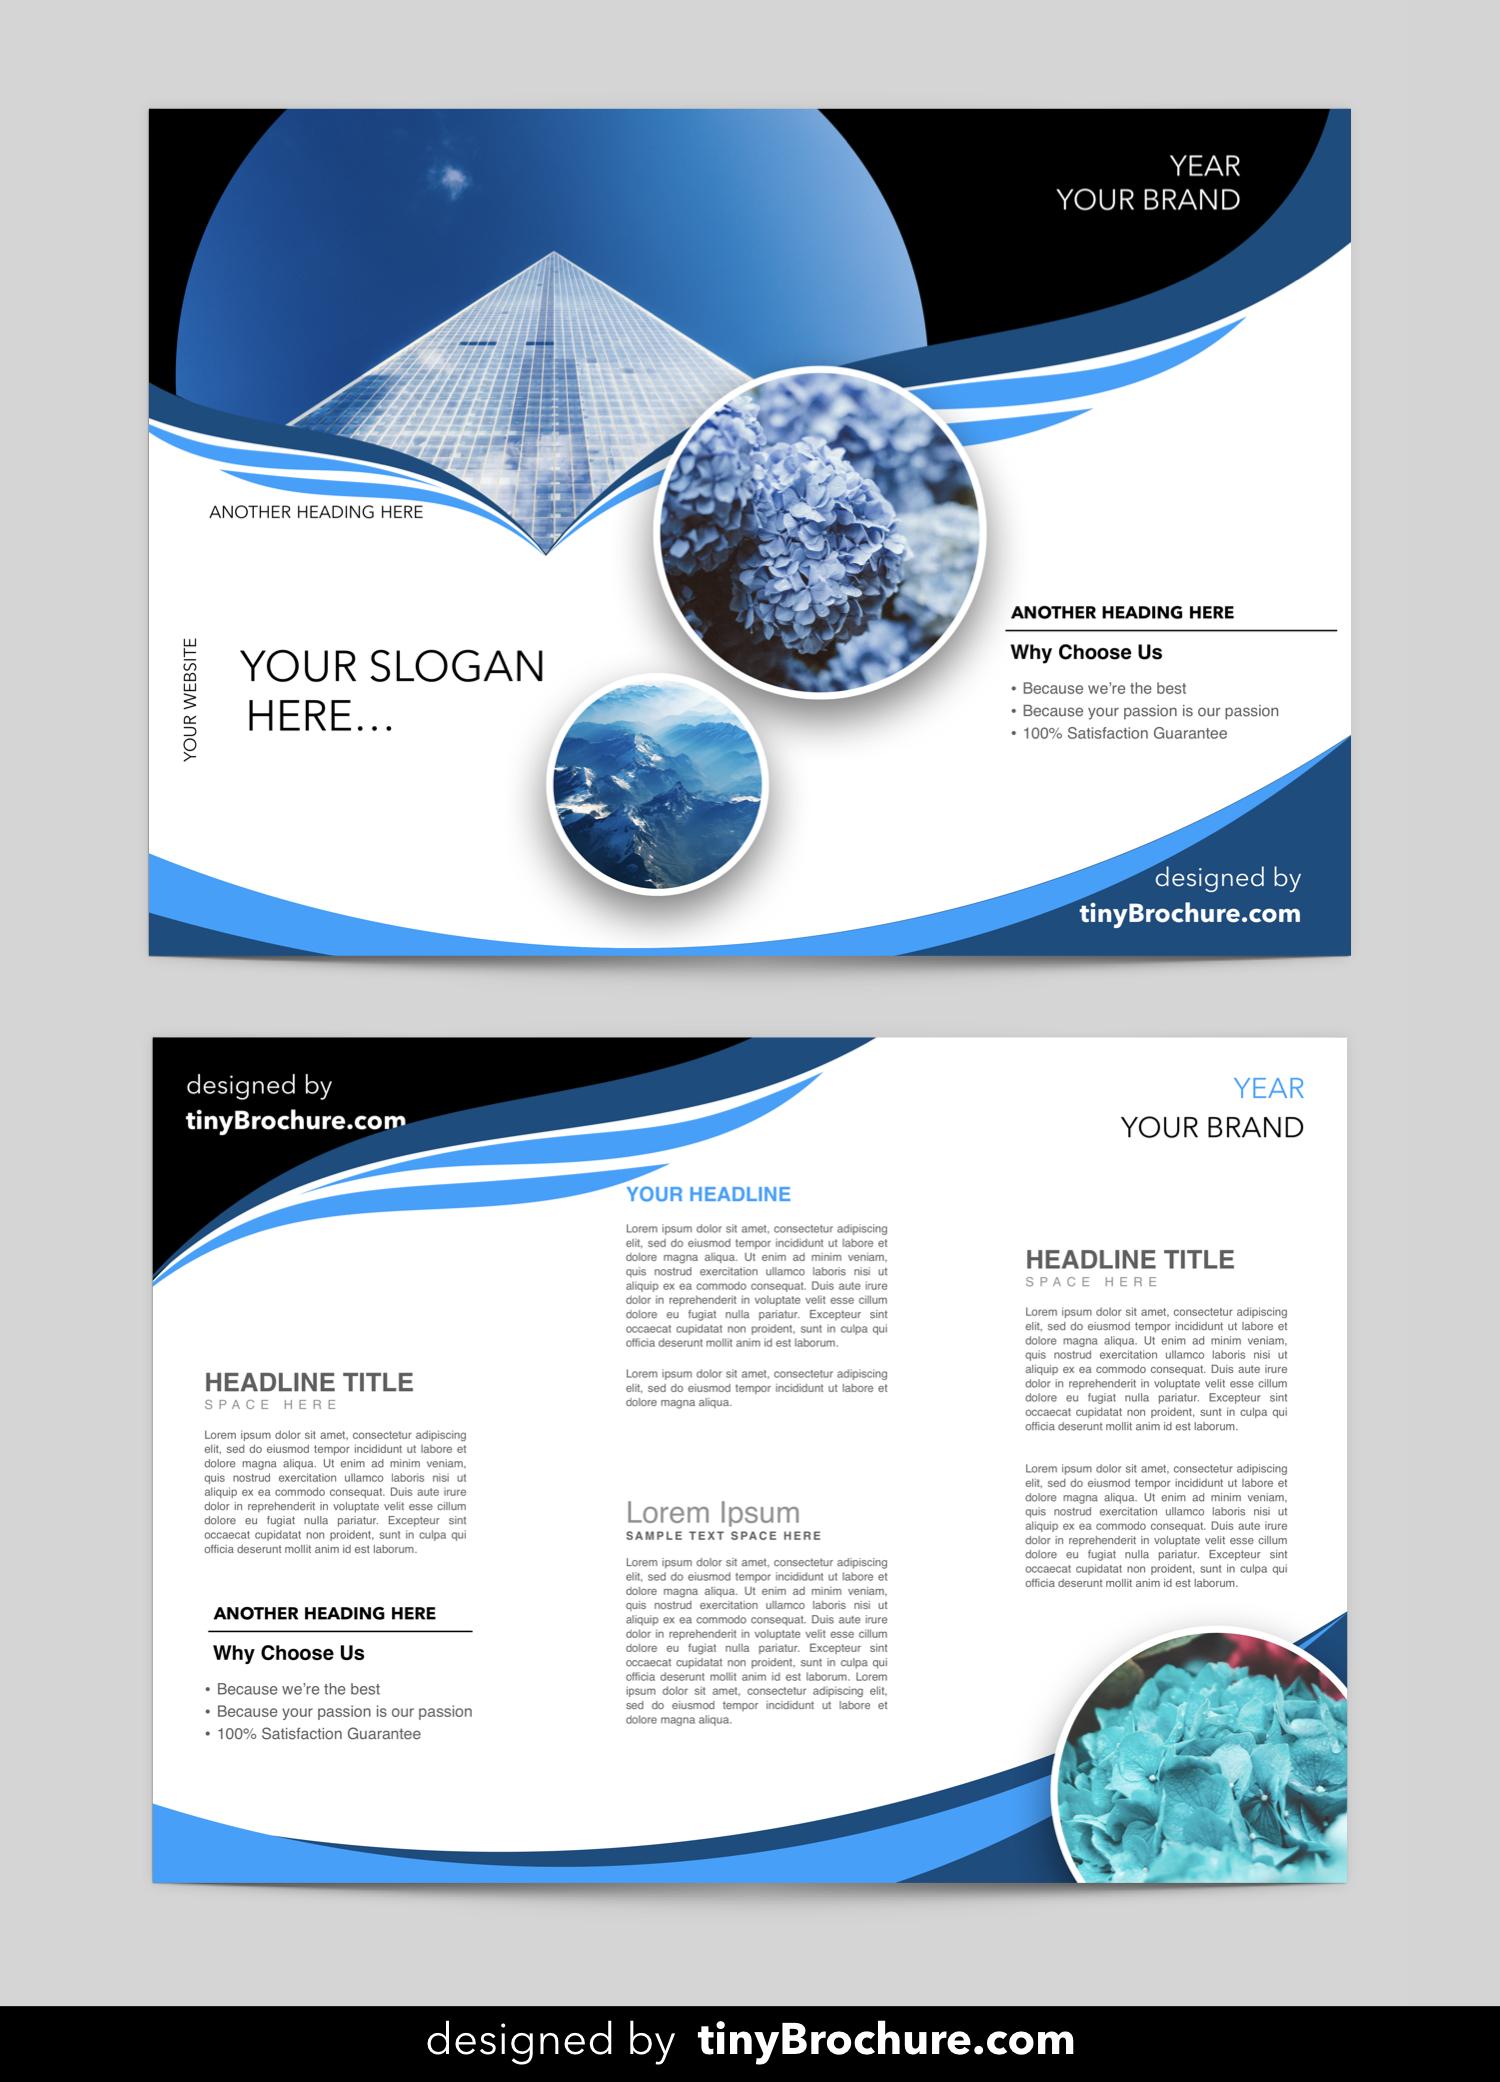 003 Microsoft Brochure Template Free Ideas Wondrous Regarding Free Brochure Templates For Word 2010